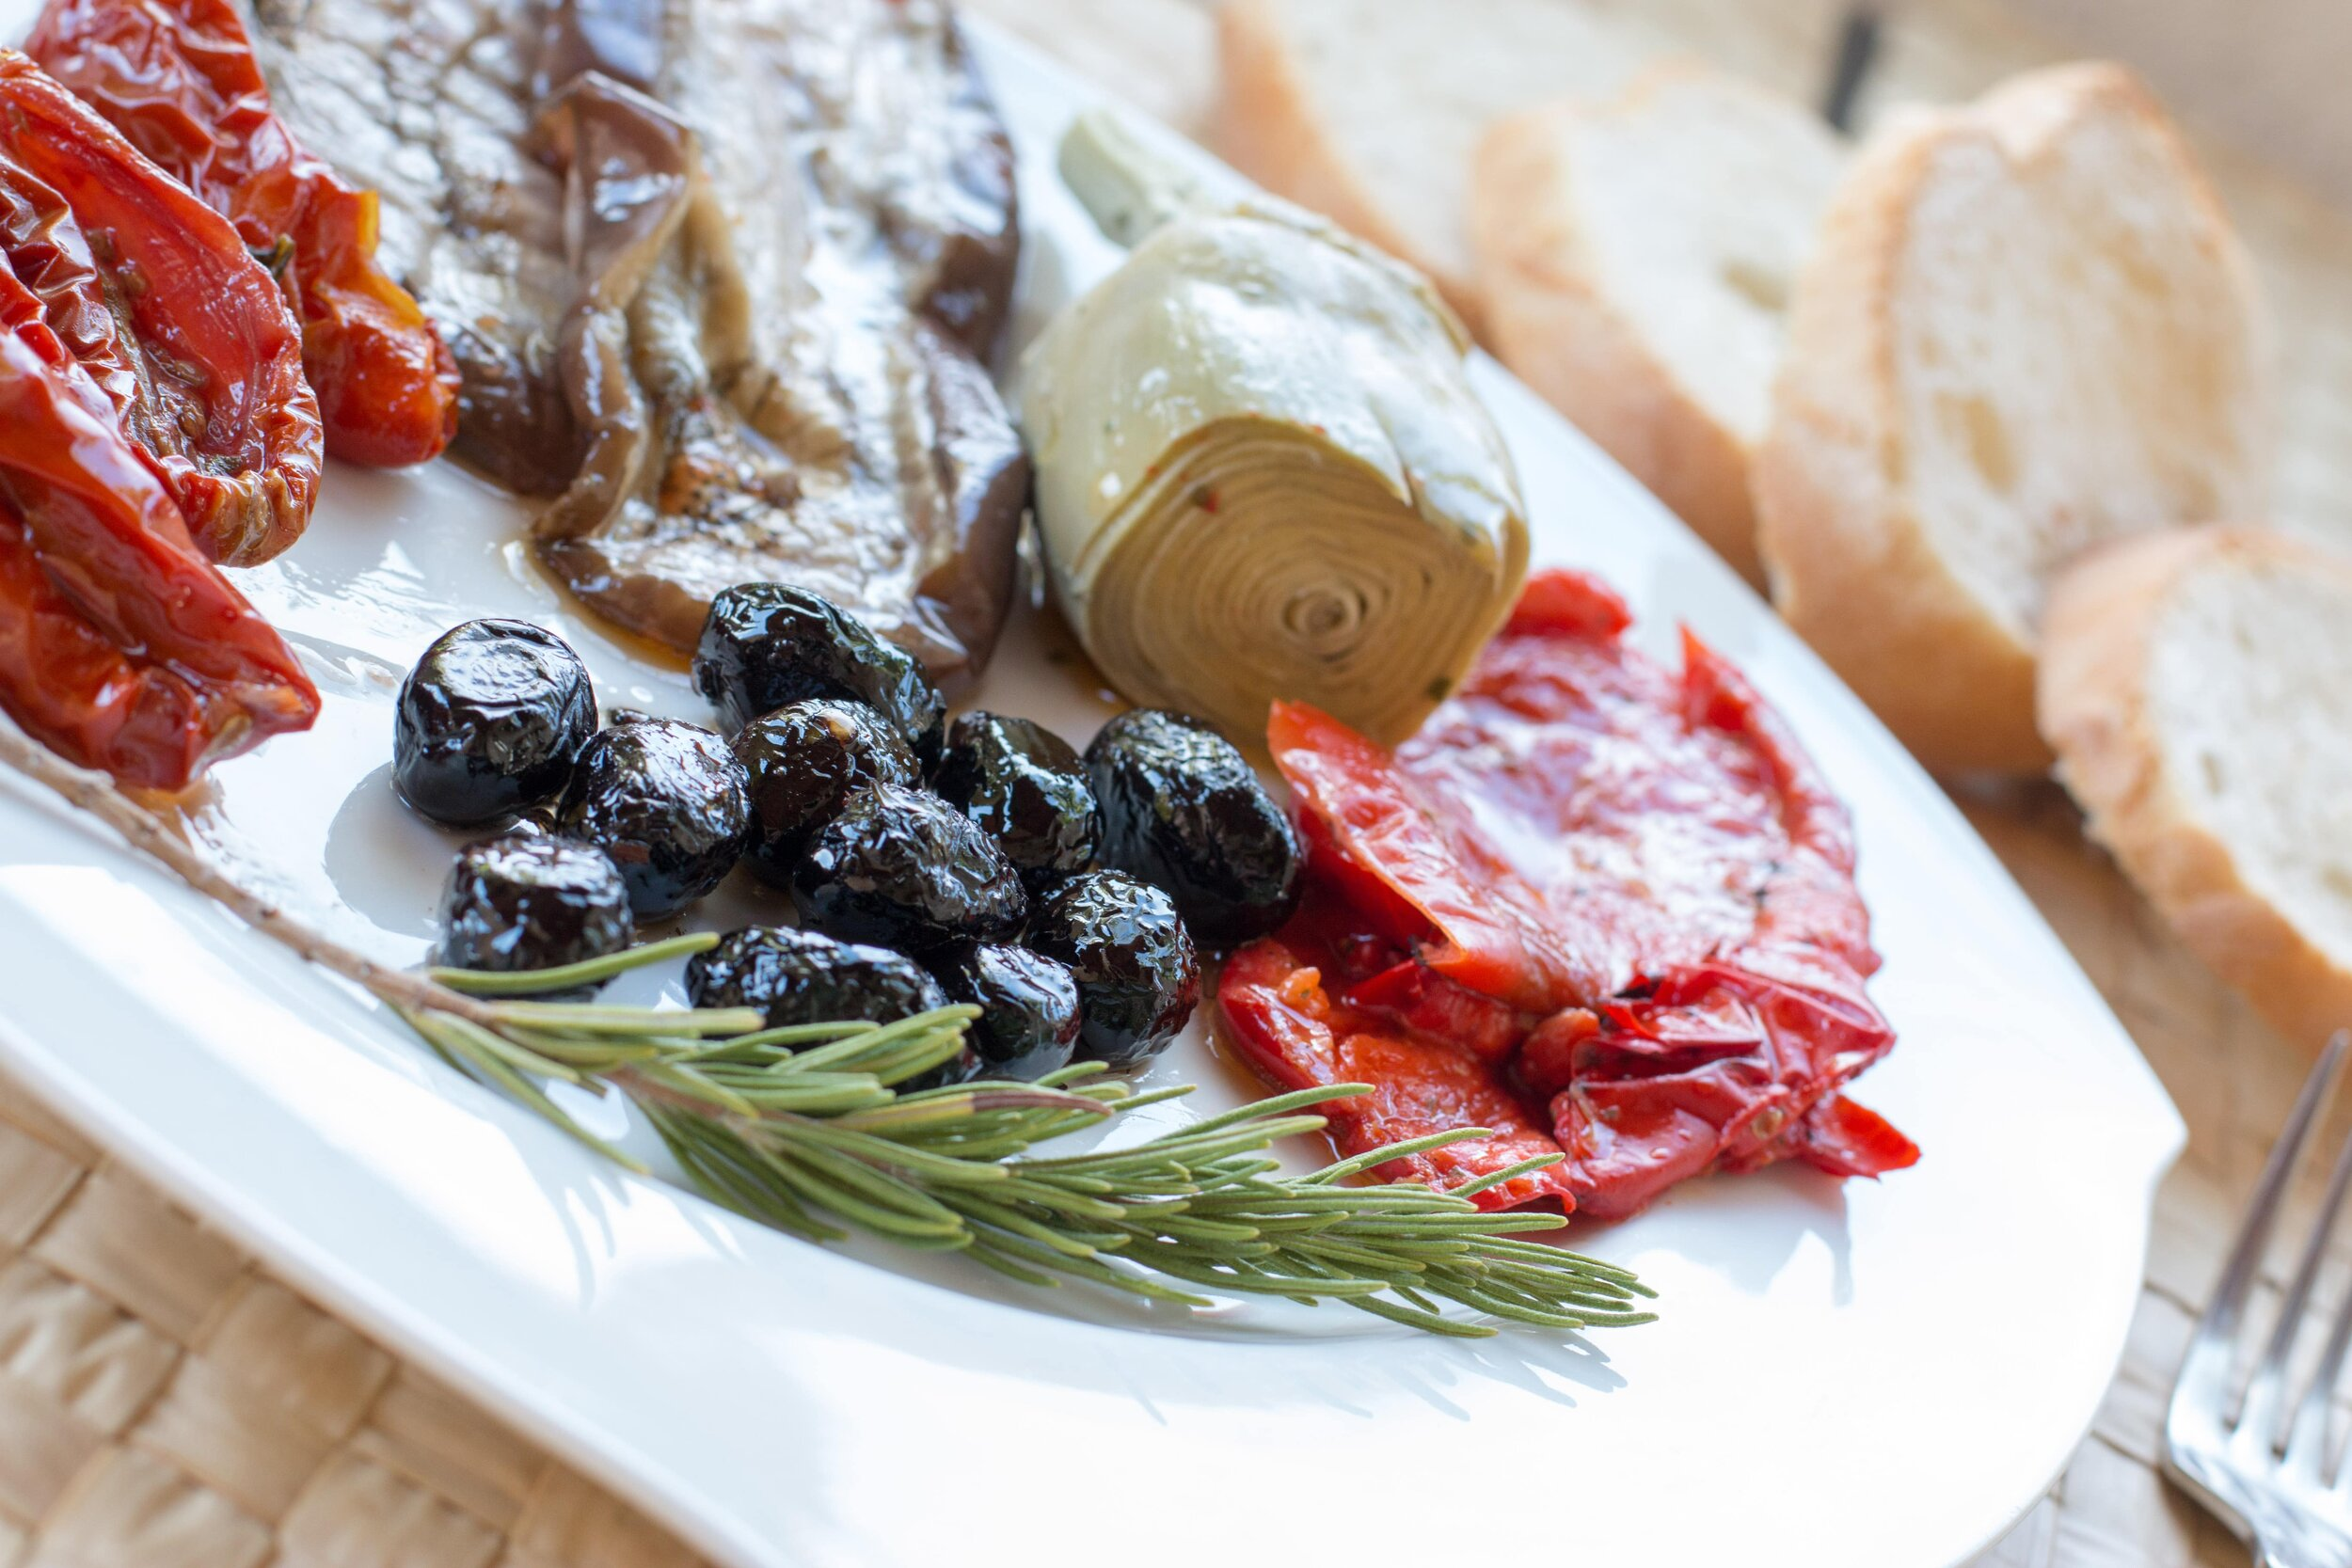 Vegan antipasti at vegan Italian restaurant